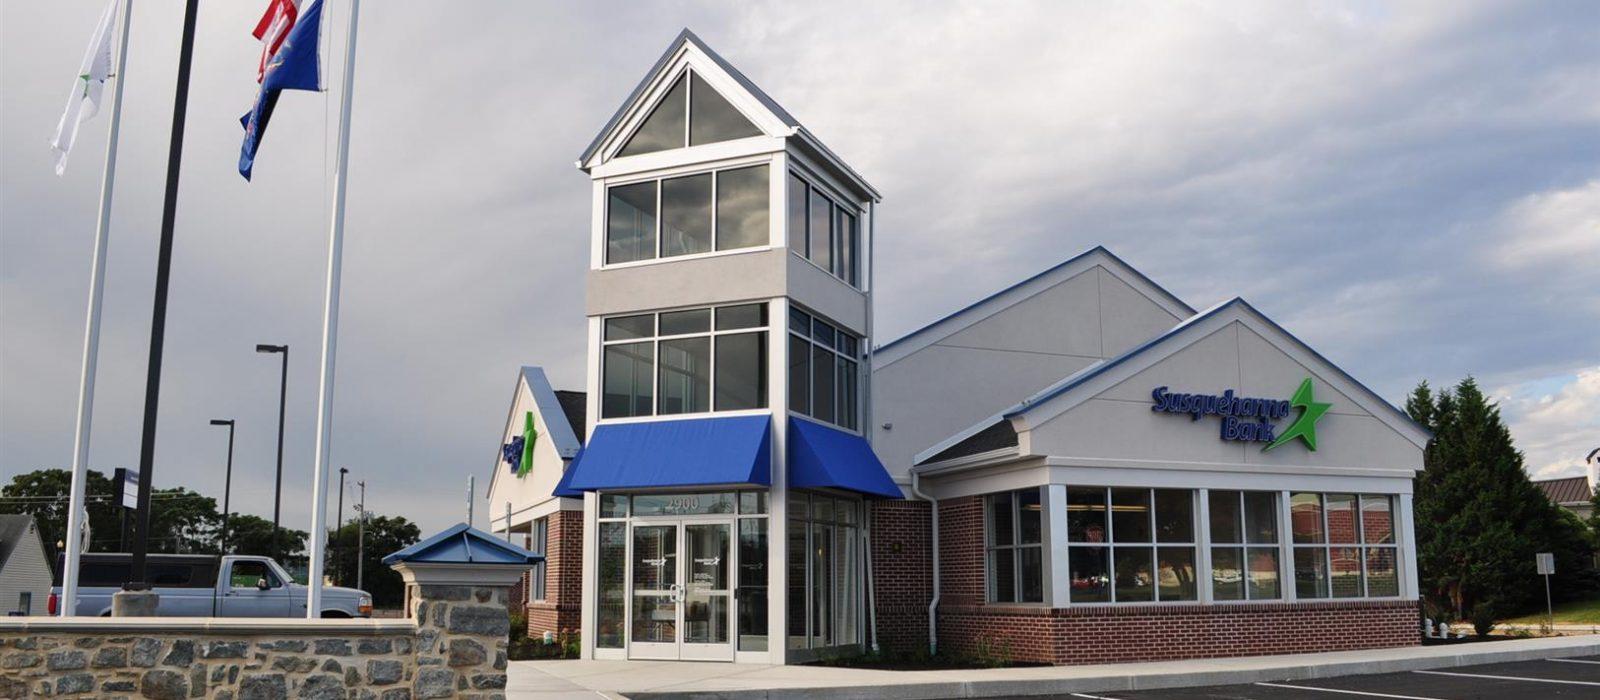 Susquehanna Bank Whiteford